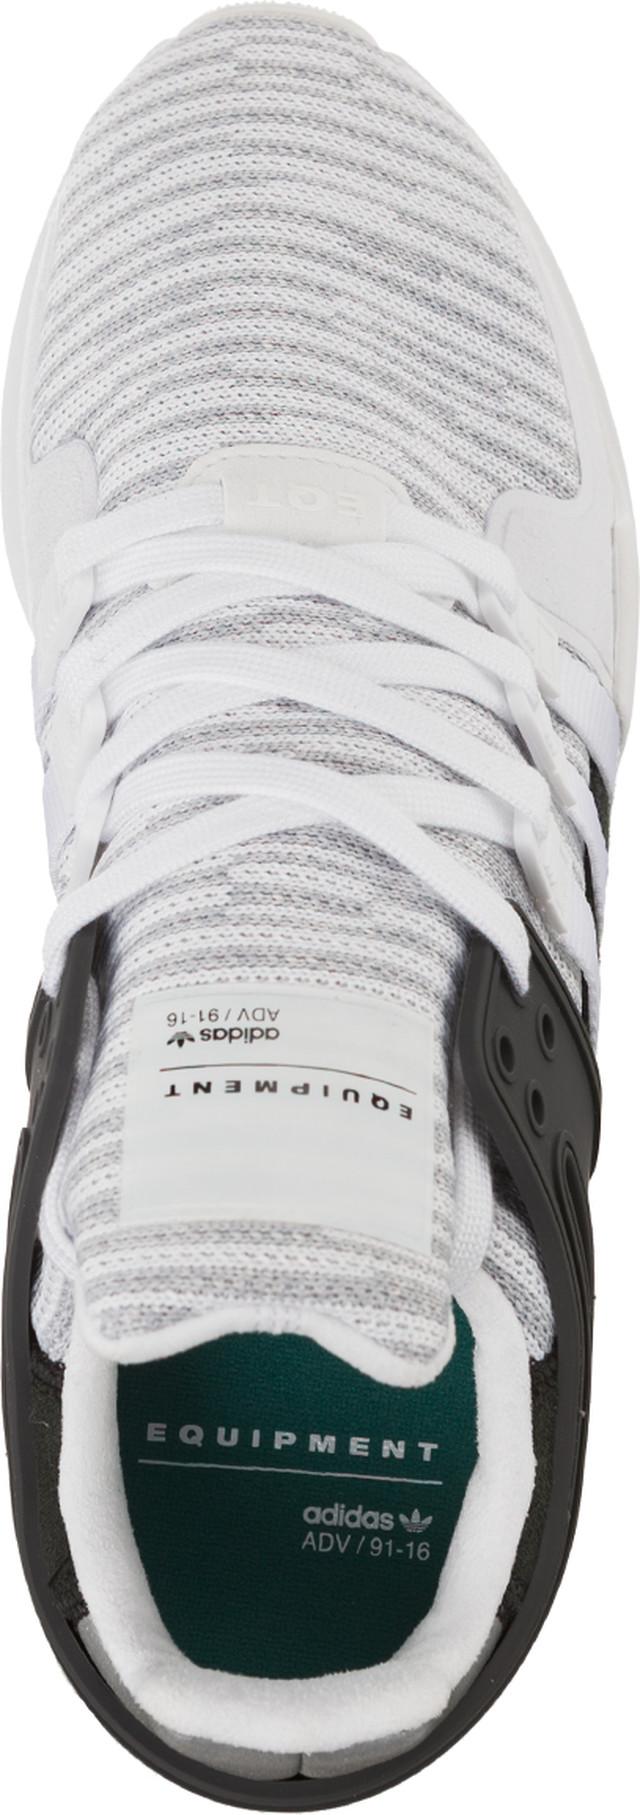 online store 19298 8af82 Buty adidas EQT SUPPORT ADV 296 - eastend.pl